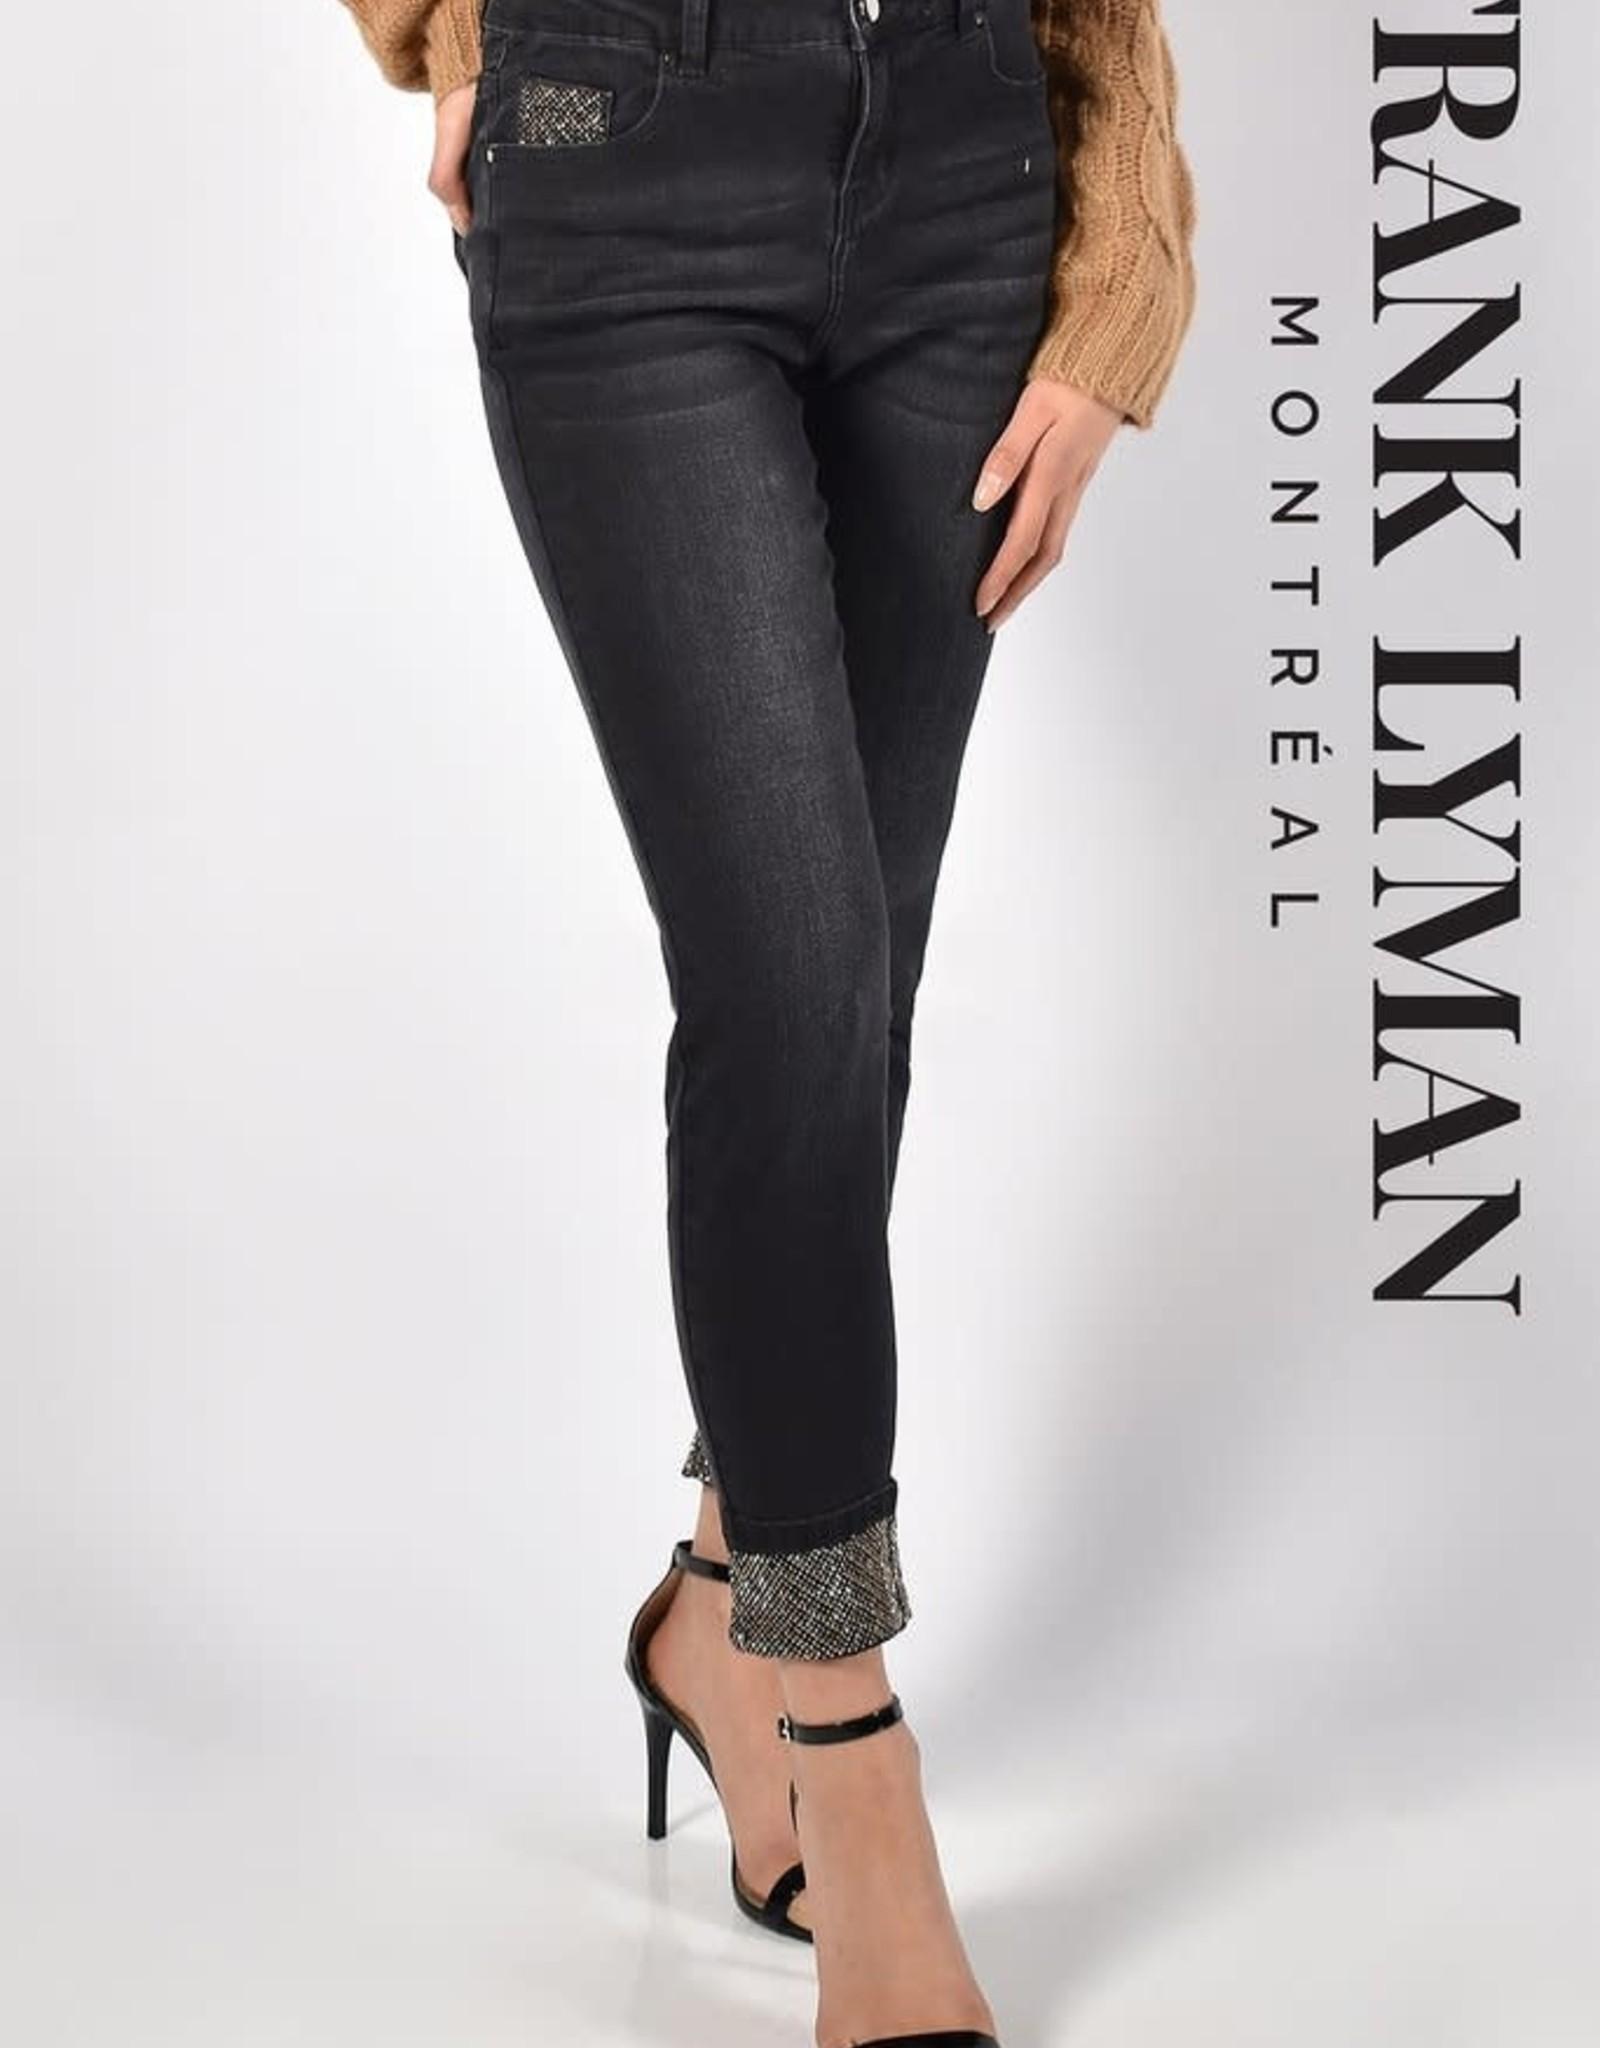 Frank Lyman Diamond Cut Sequin Jeans